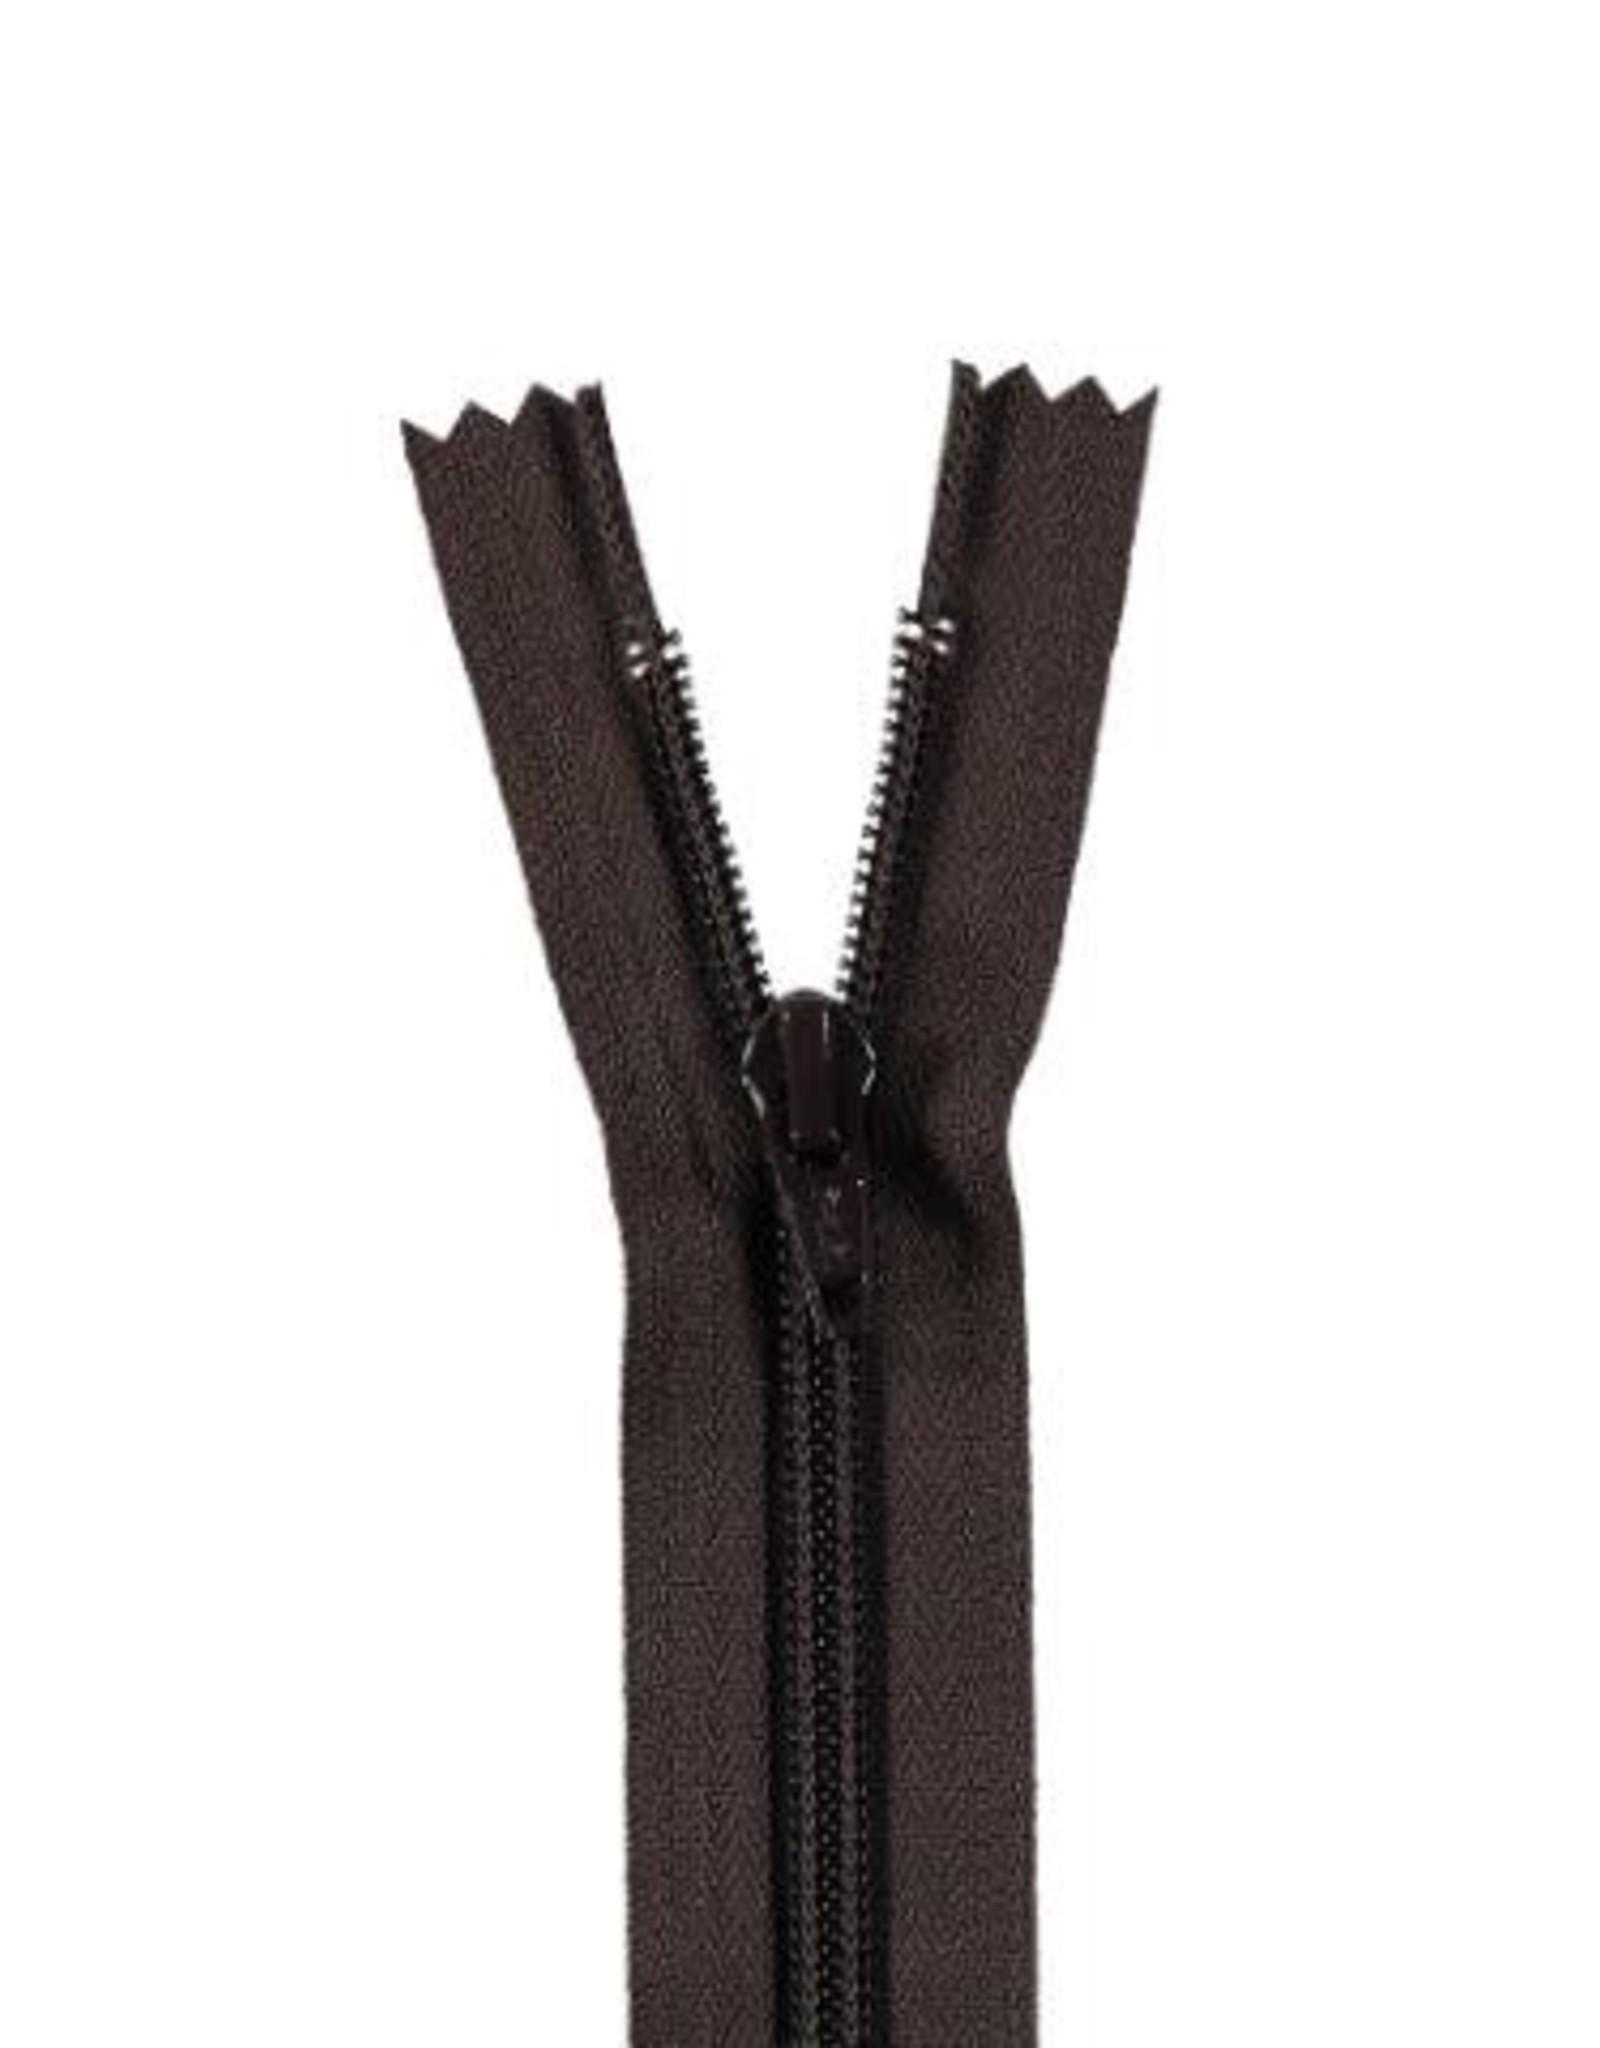 YKK Spiraalrits niet-DB 3mm donker bruin 570-22cm